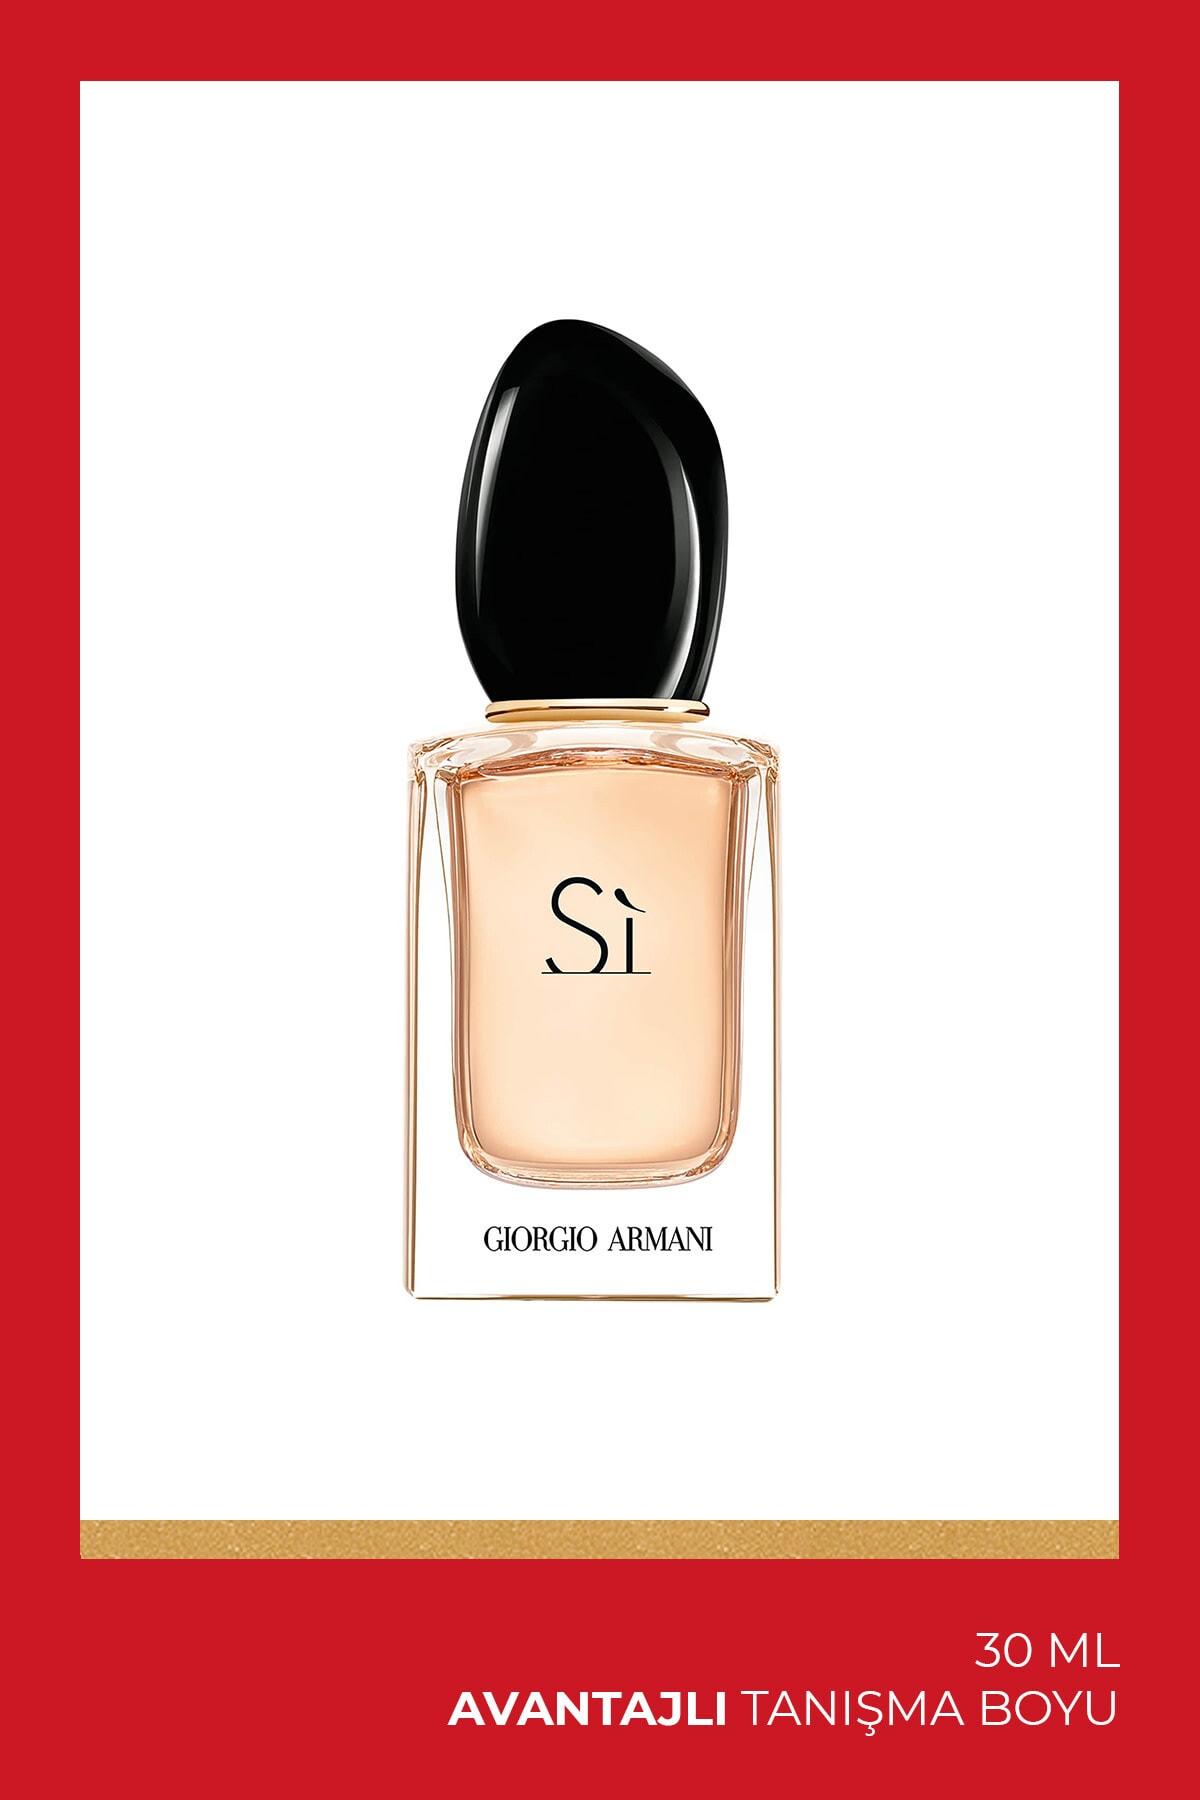 Giorgio Armani Si Edp 30 ml Kadın Parfüm 3605521816511 1